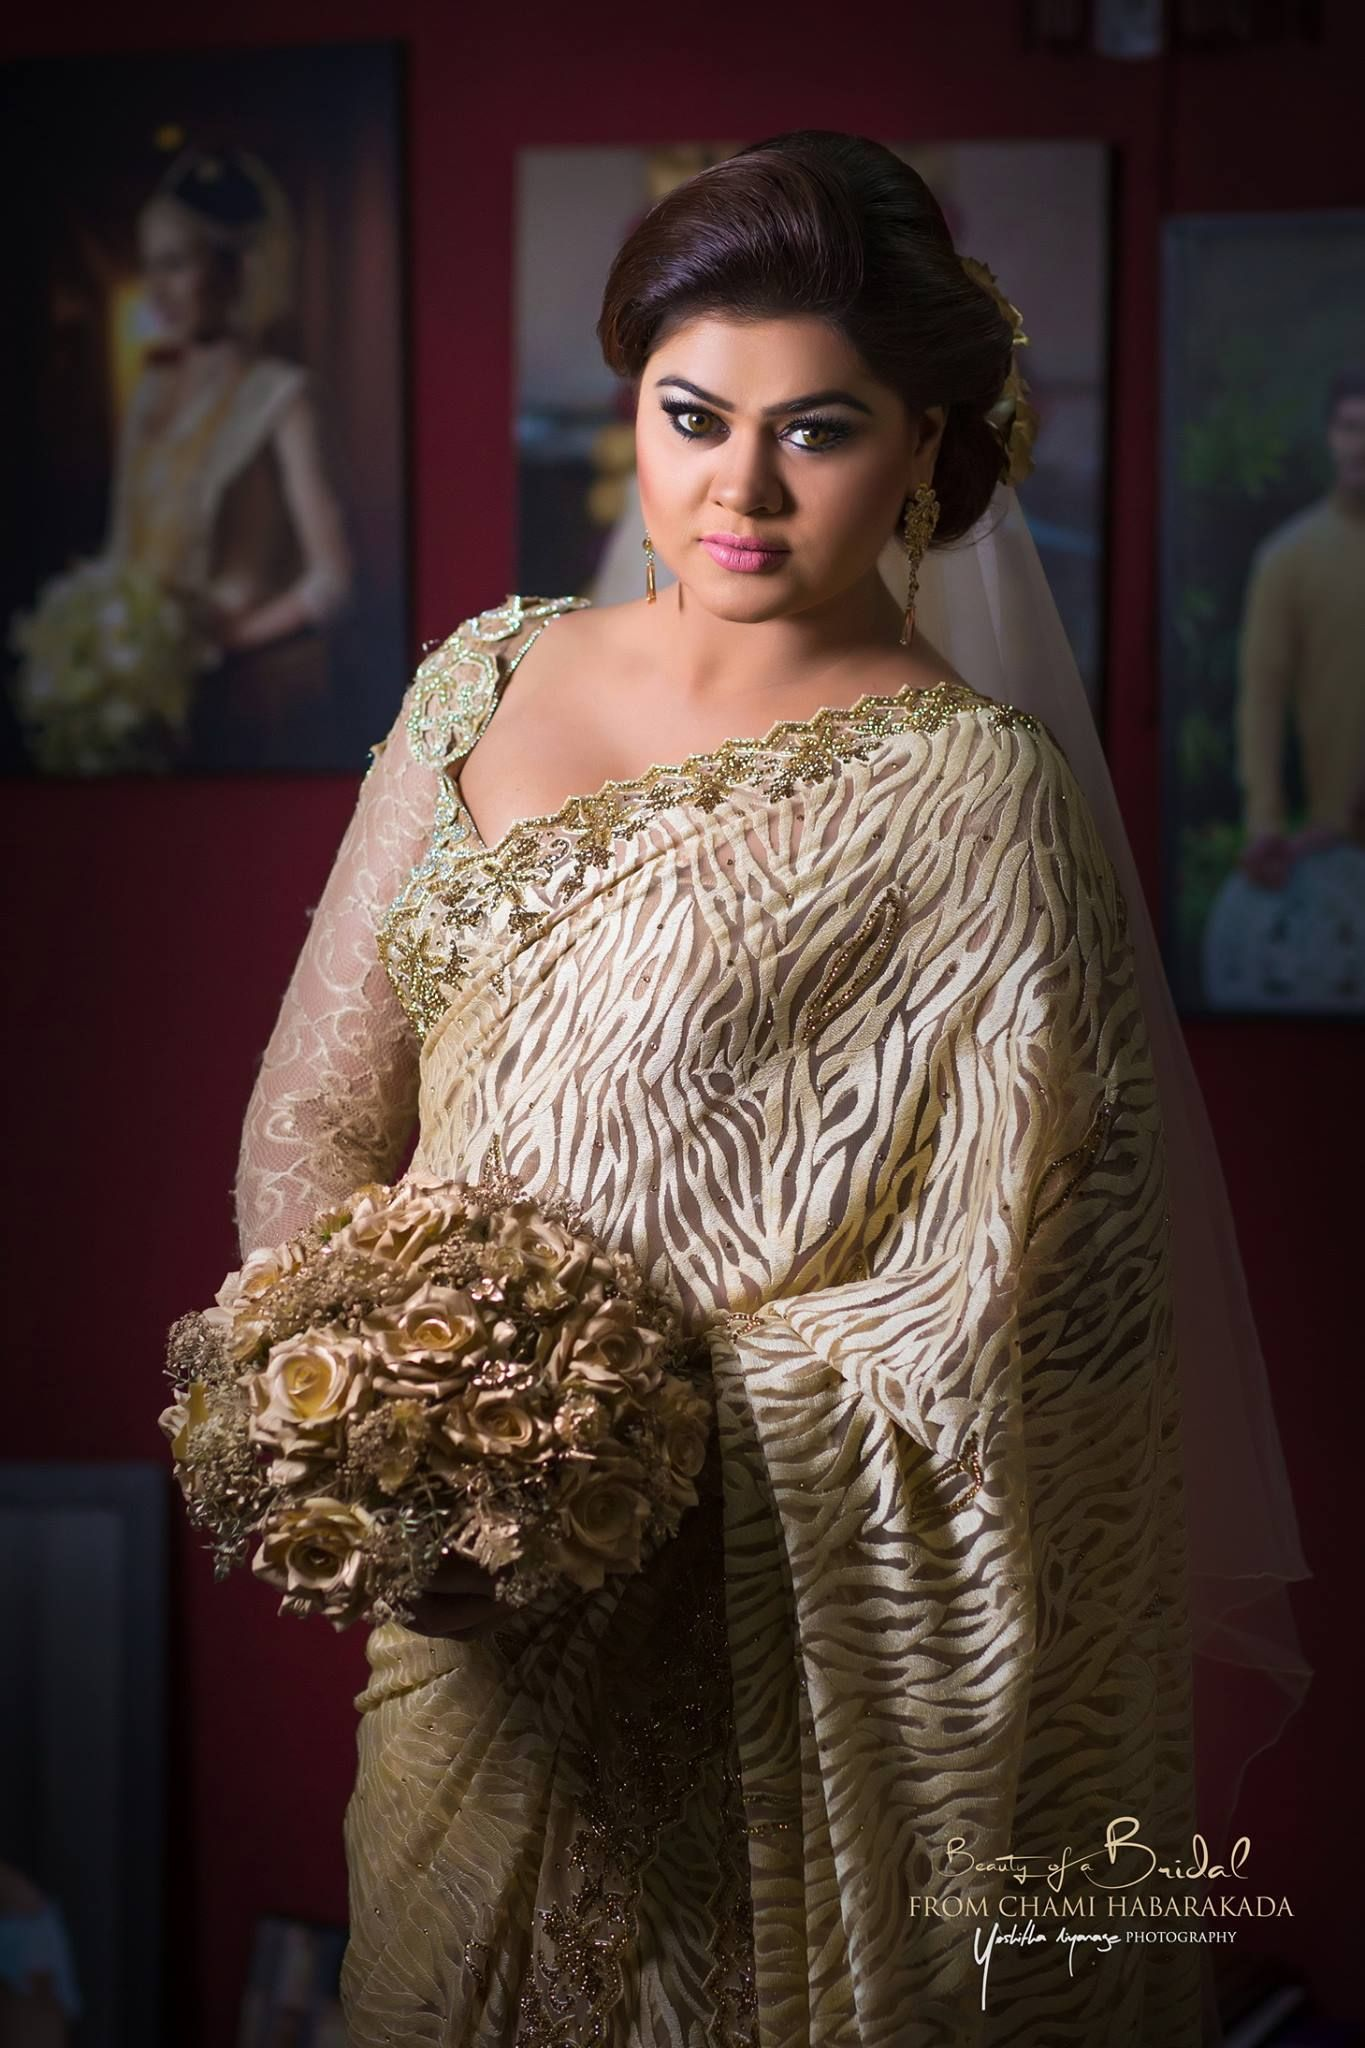 Bridal Dresser Chami Habarakada Sri Lanka